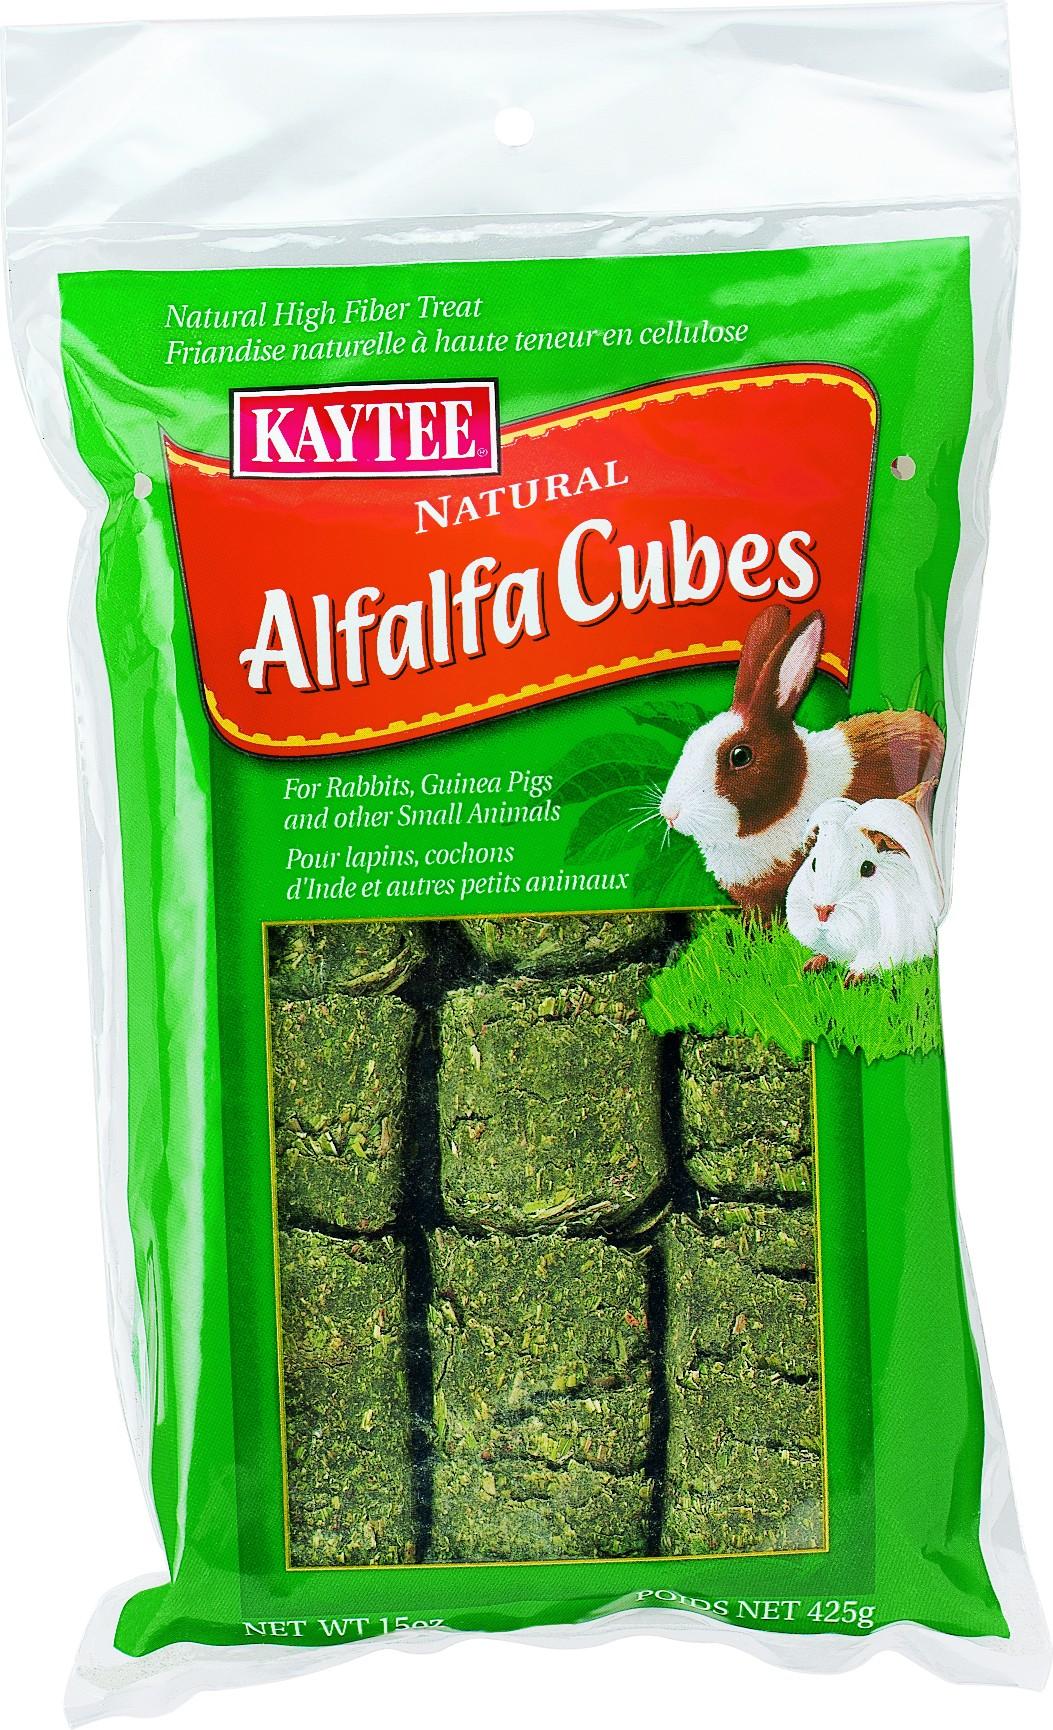 Alfalfa Cubes 15 Ounces